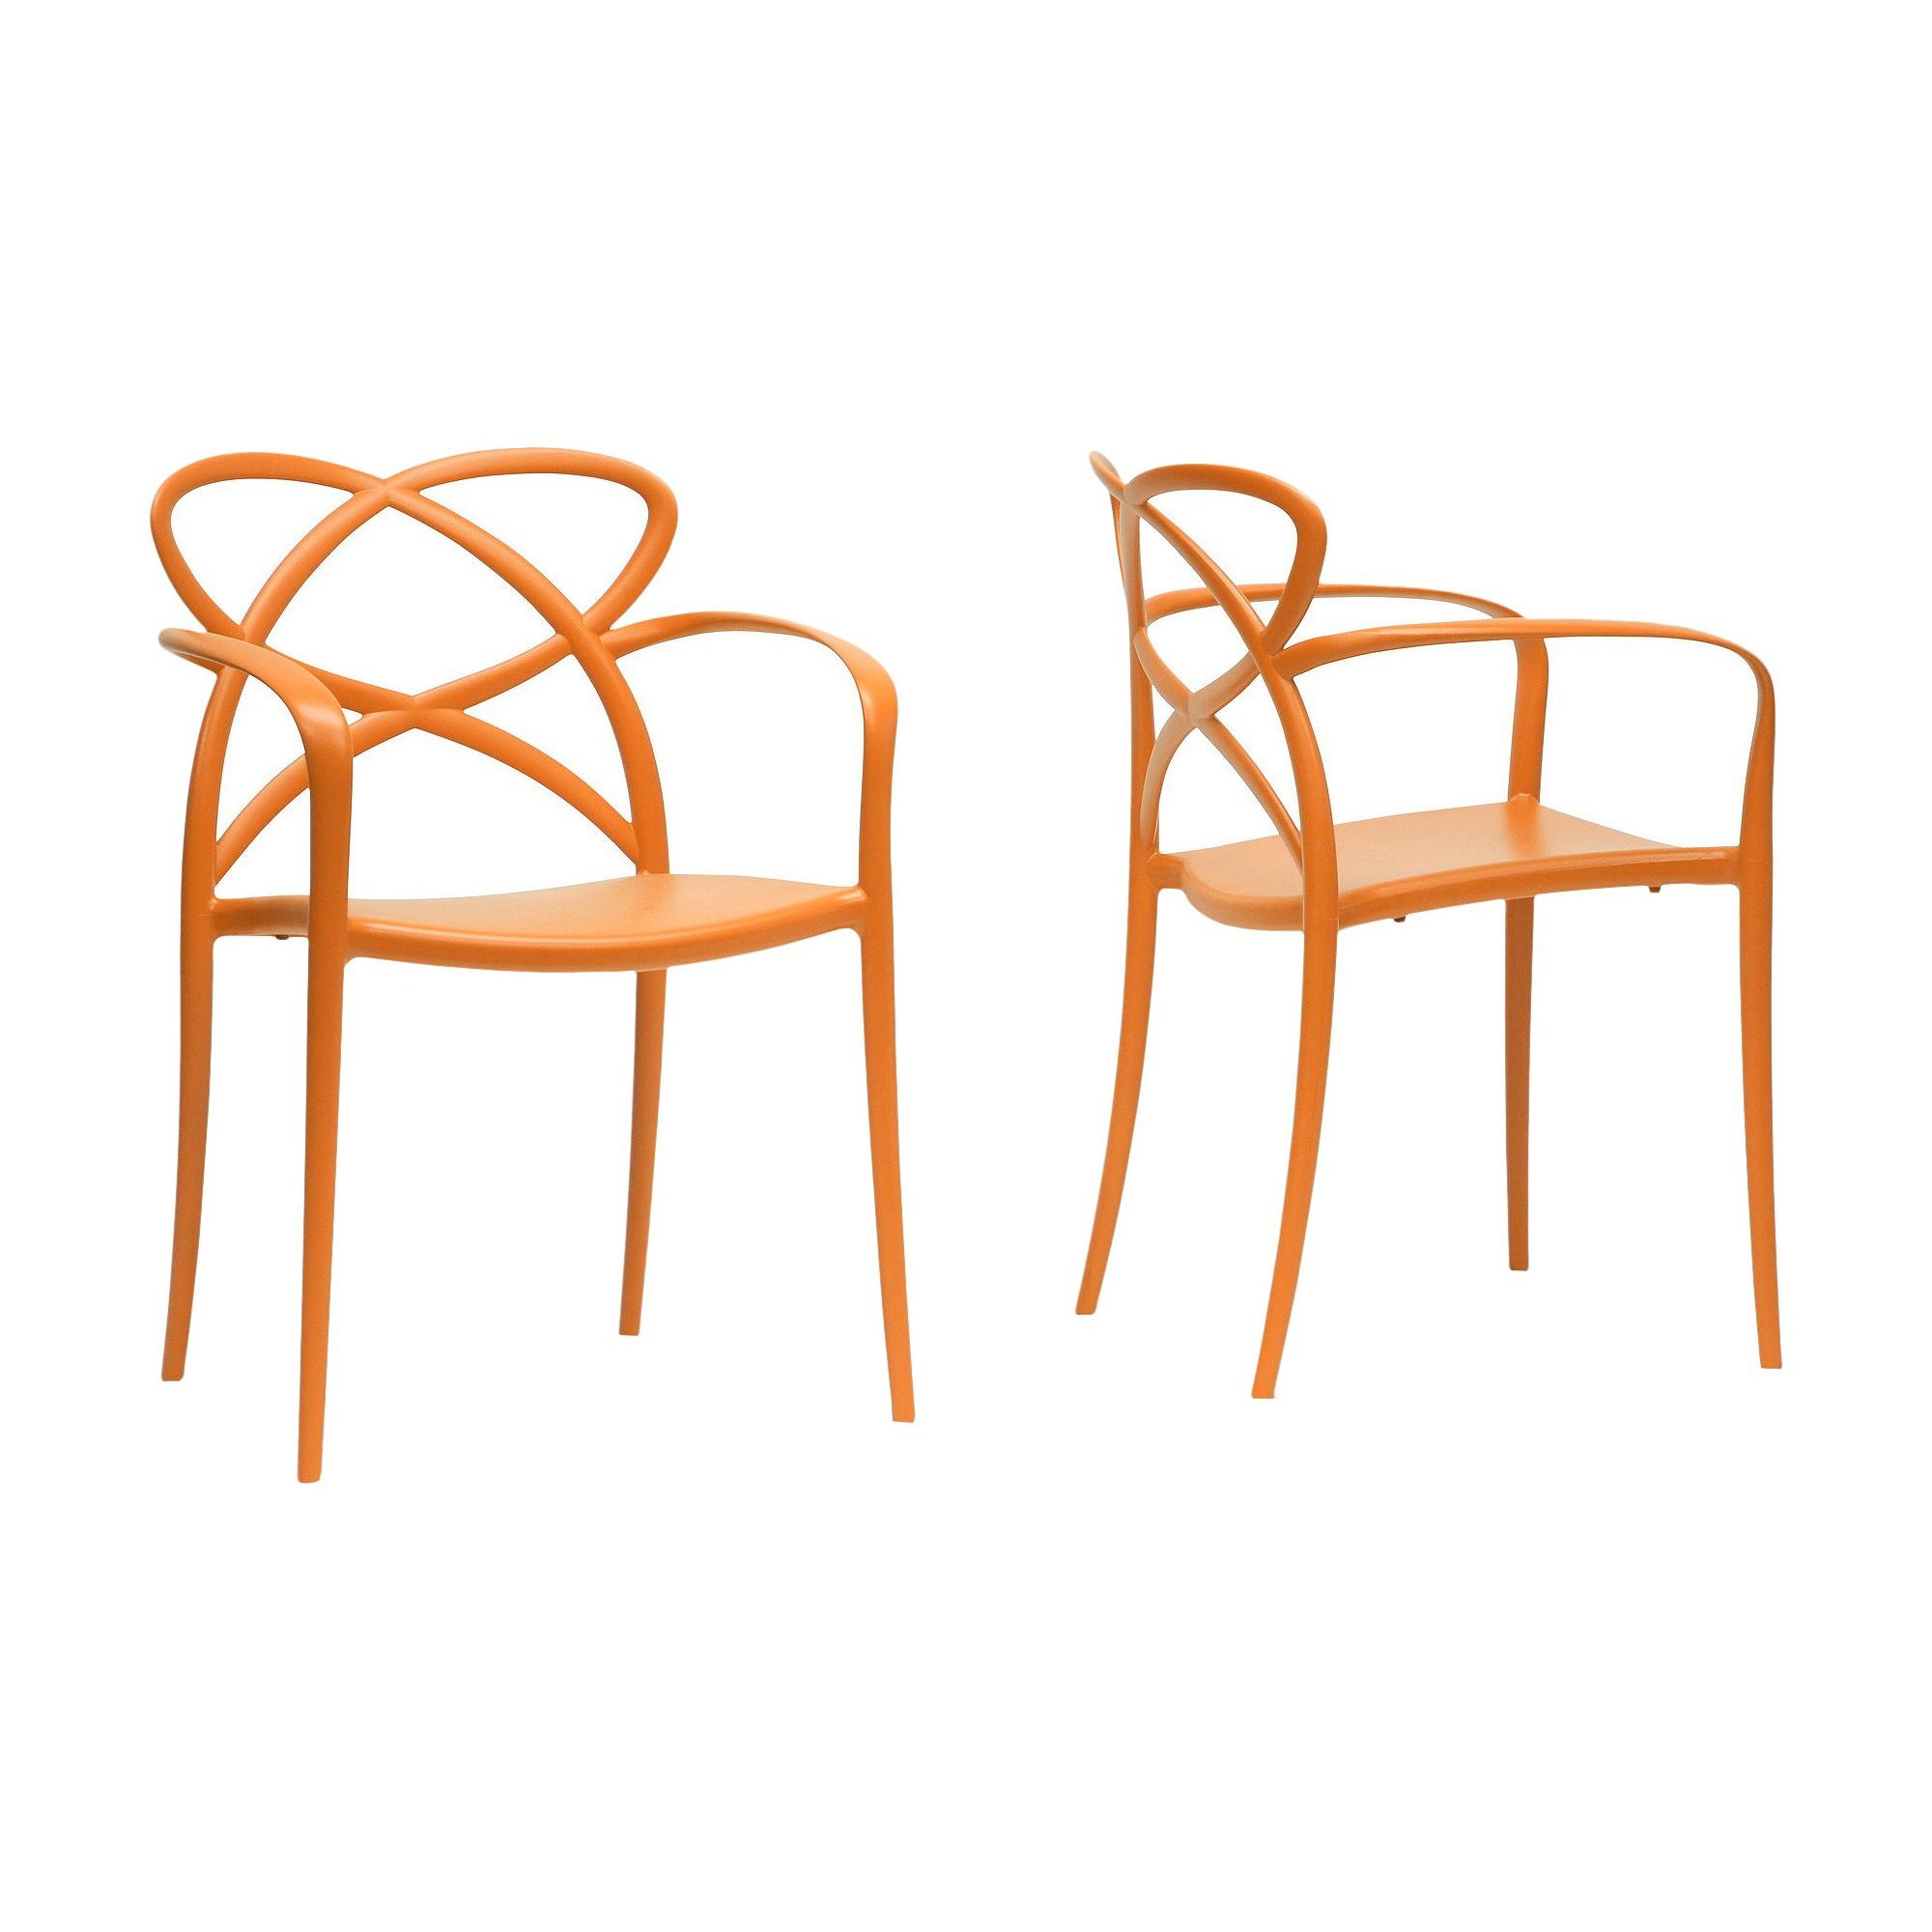 Huxx Plastic Stackable Modern Dining Chair   Orange (Set Of 2)   Baxton  Studio